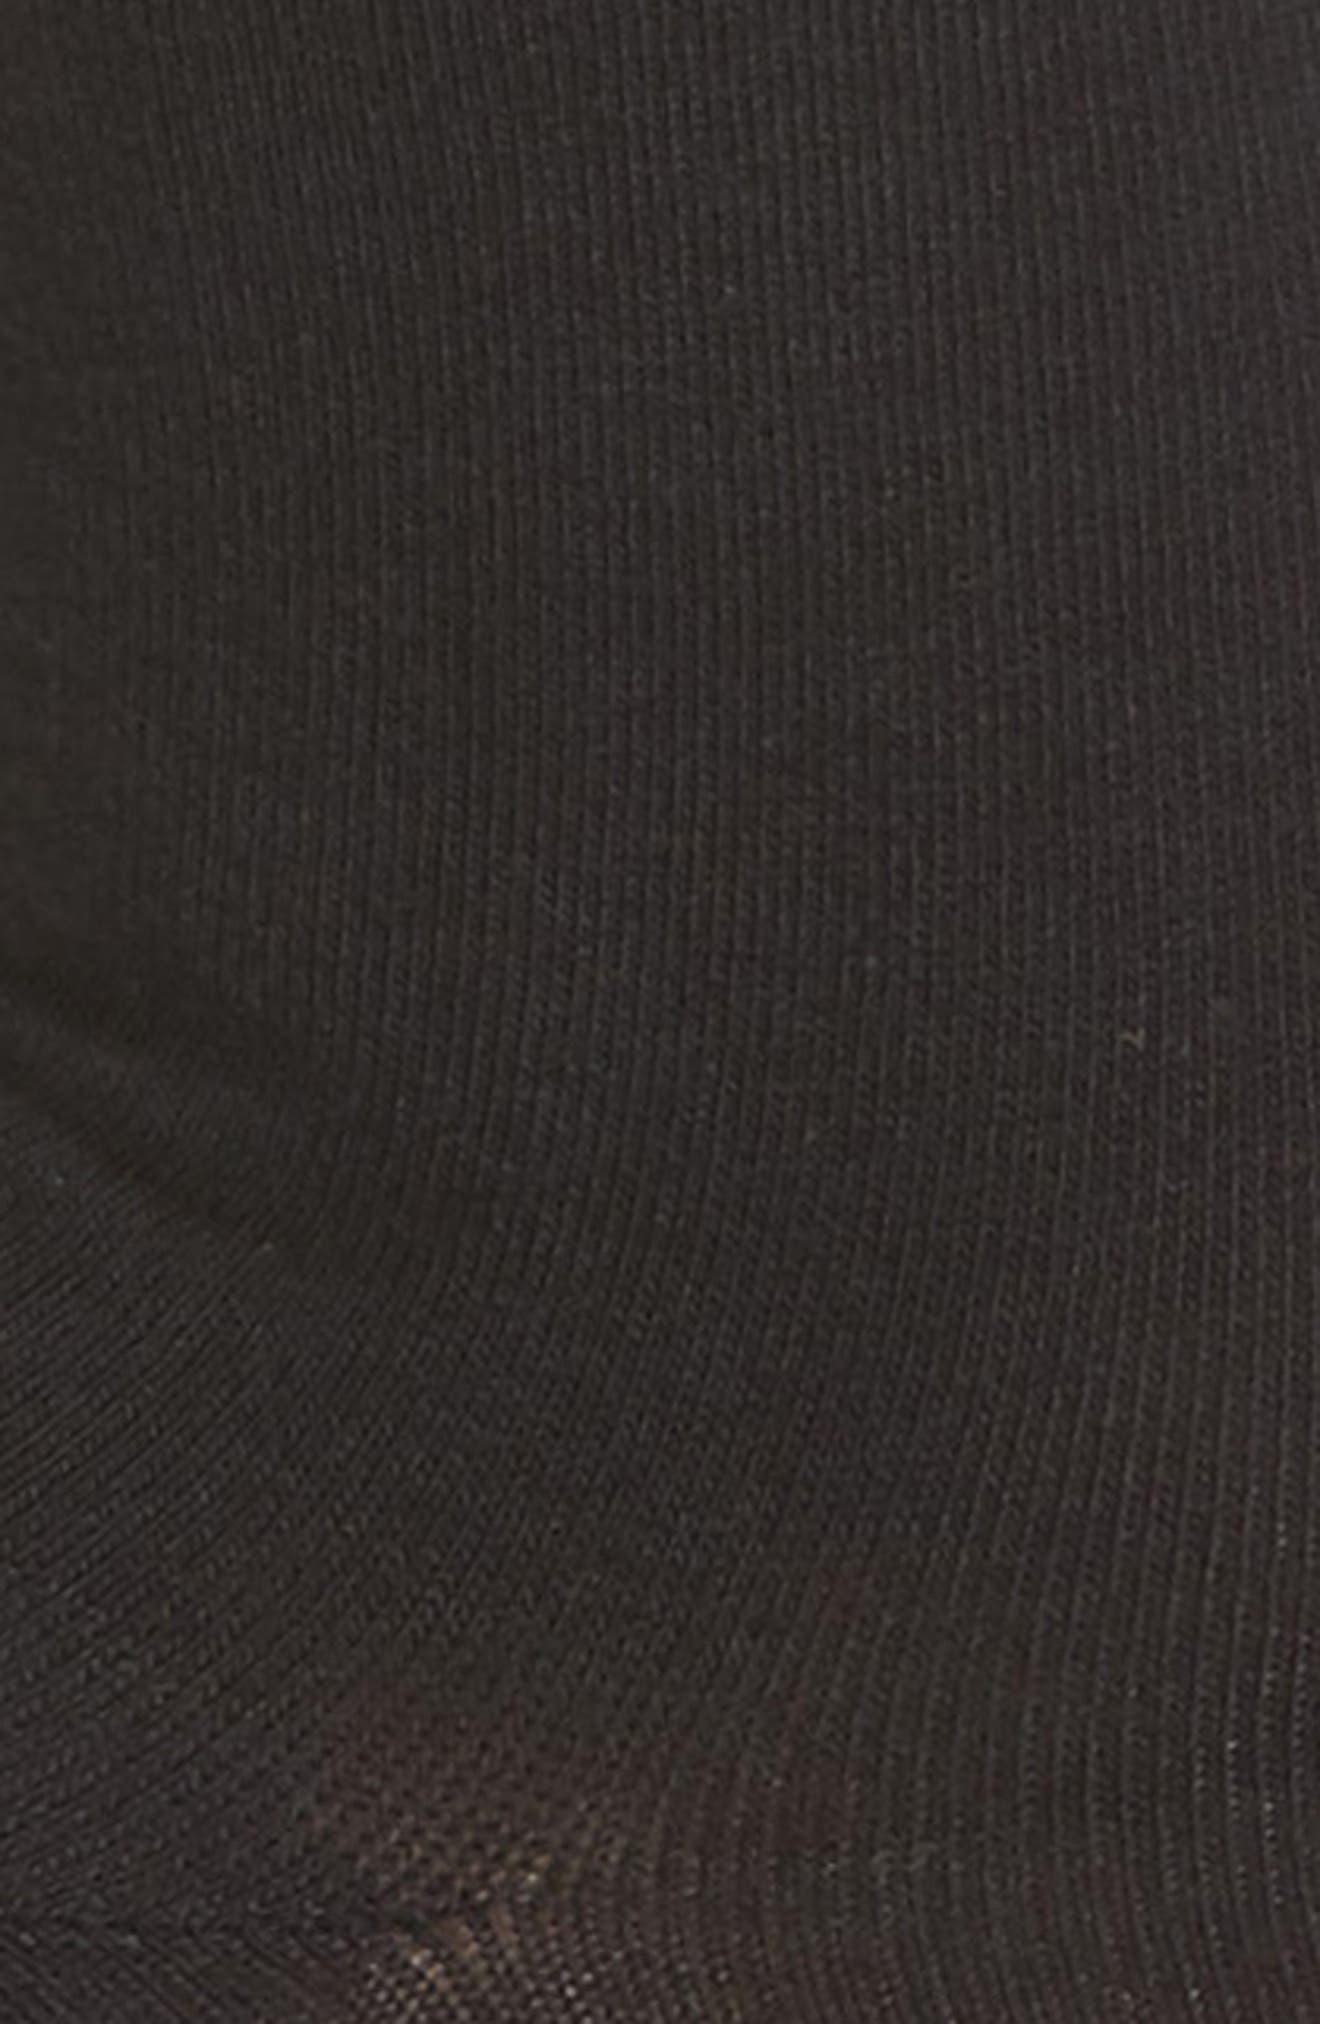 Everyday Roll Top Socks,                             Alternate thumbnail 2, color,                             BLACK